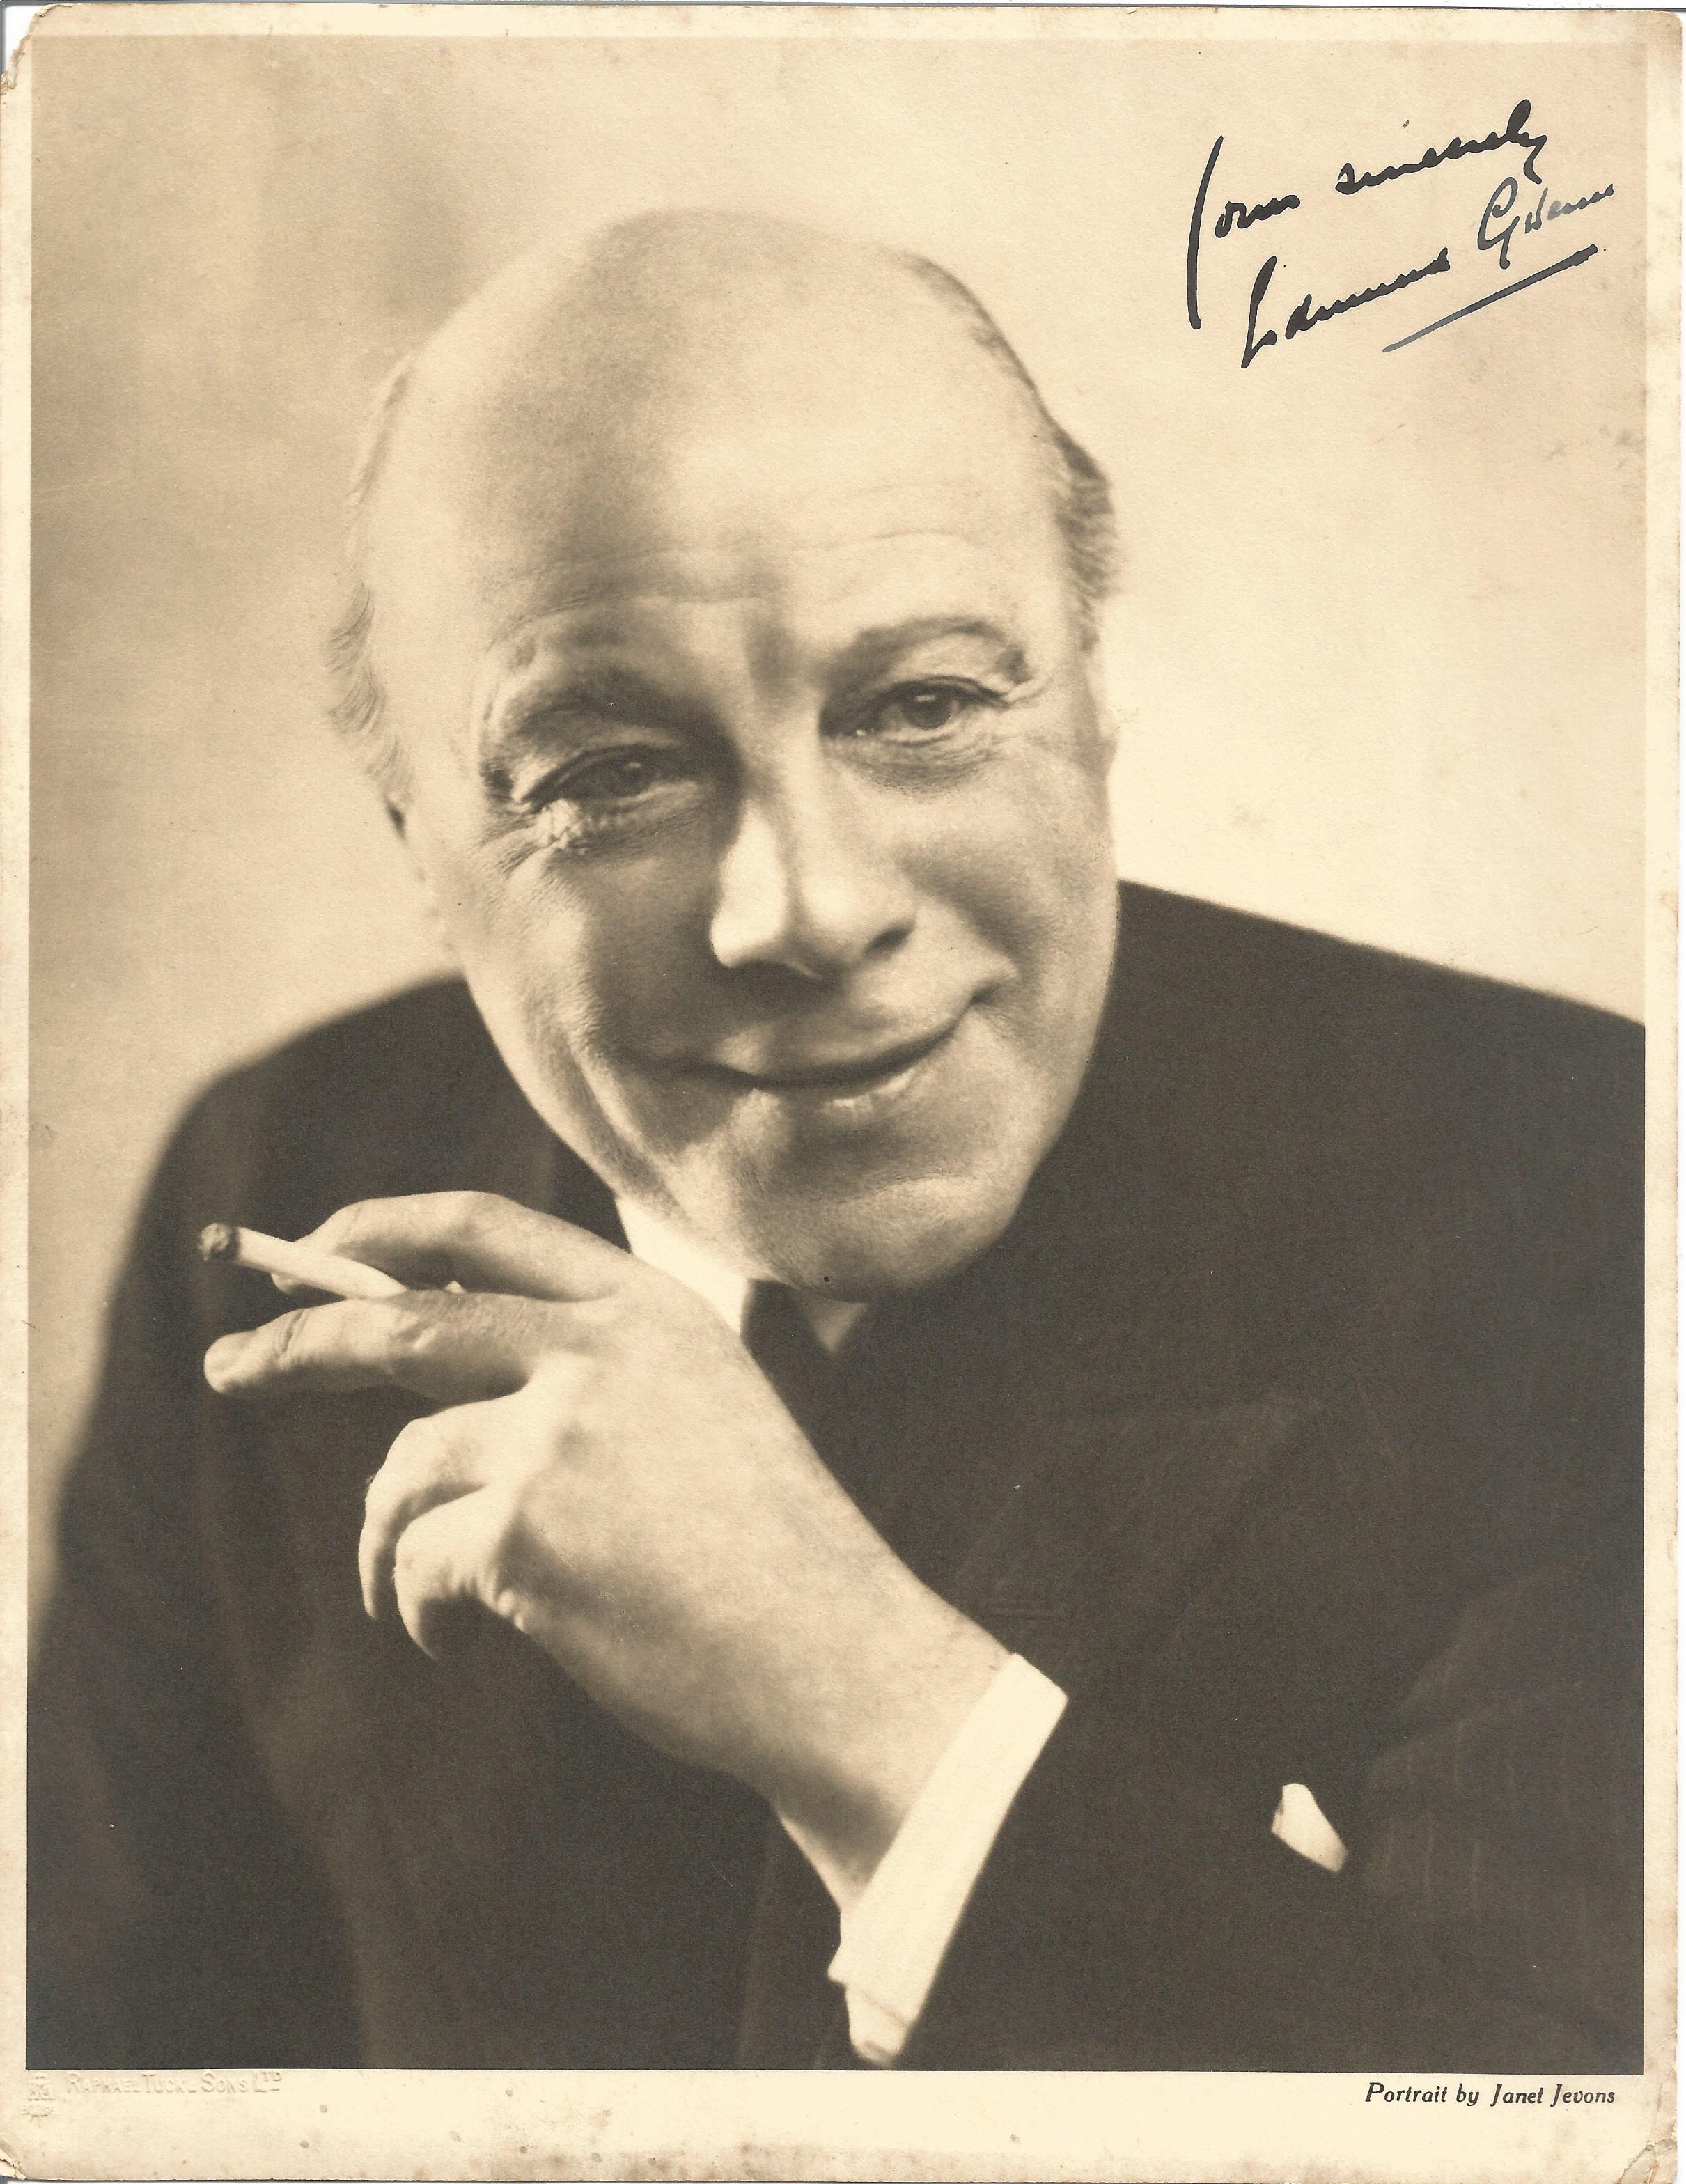 Actor Edmund Gwenn vintage signed 10x8 black and white photo. Edmund Gwenn was an English actor.